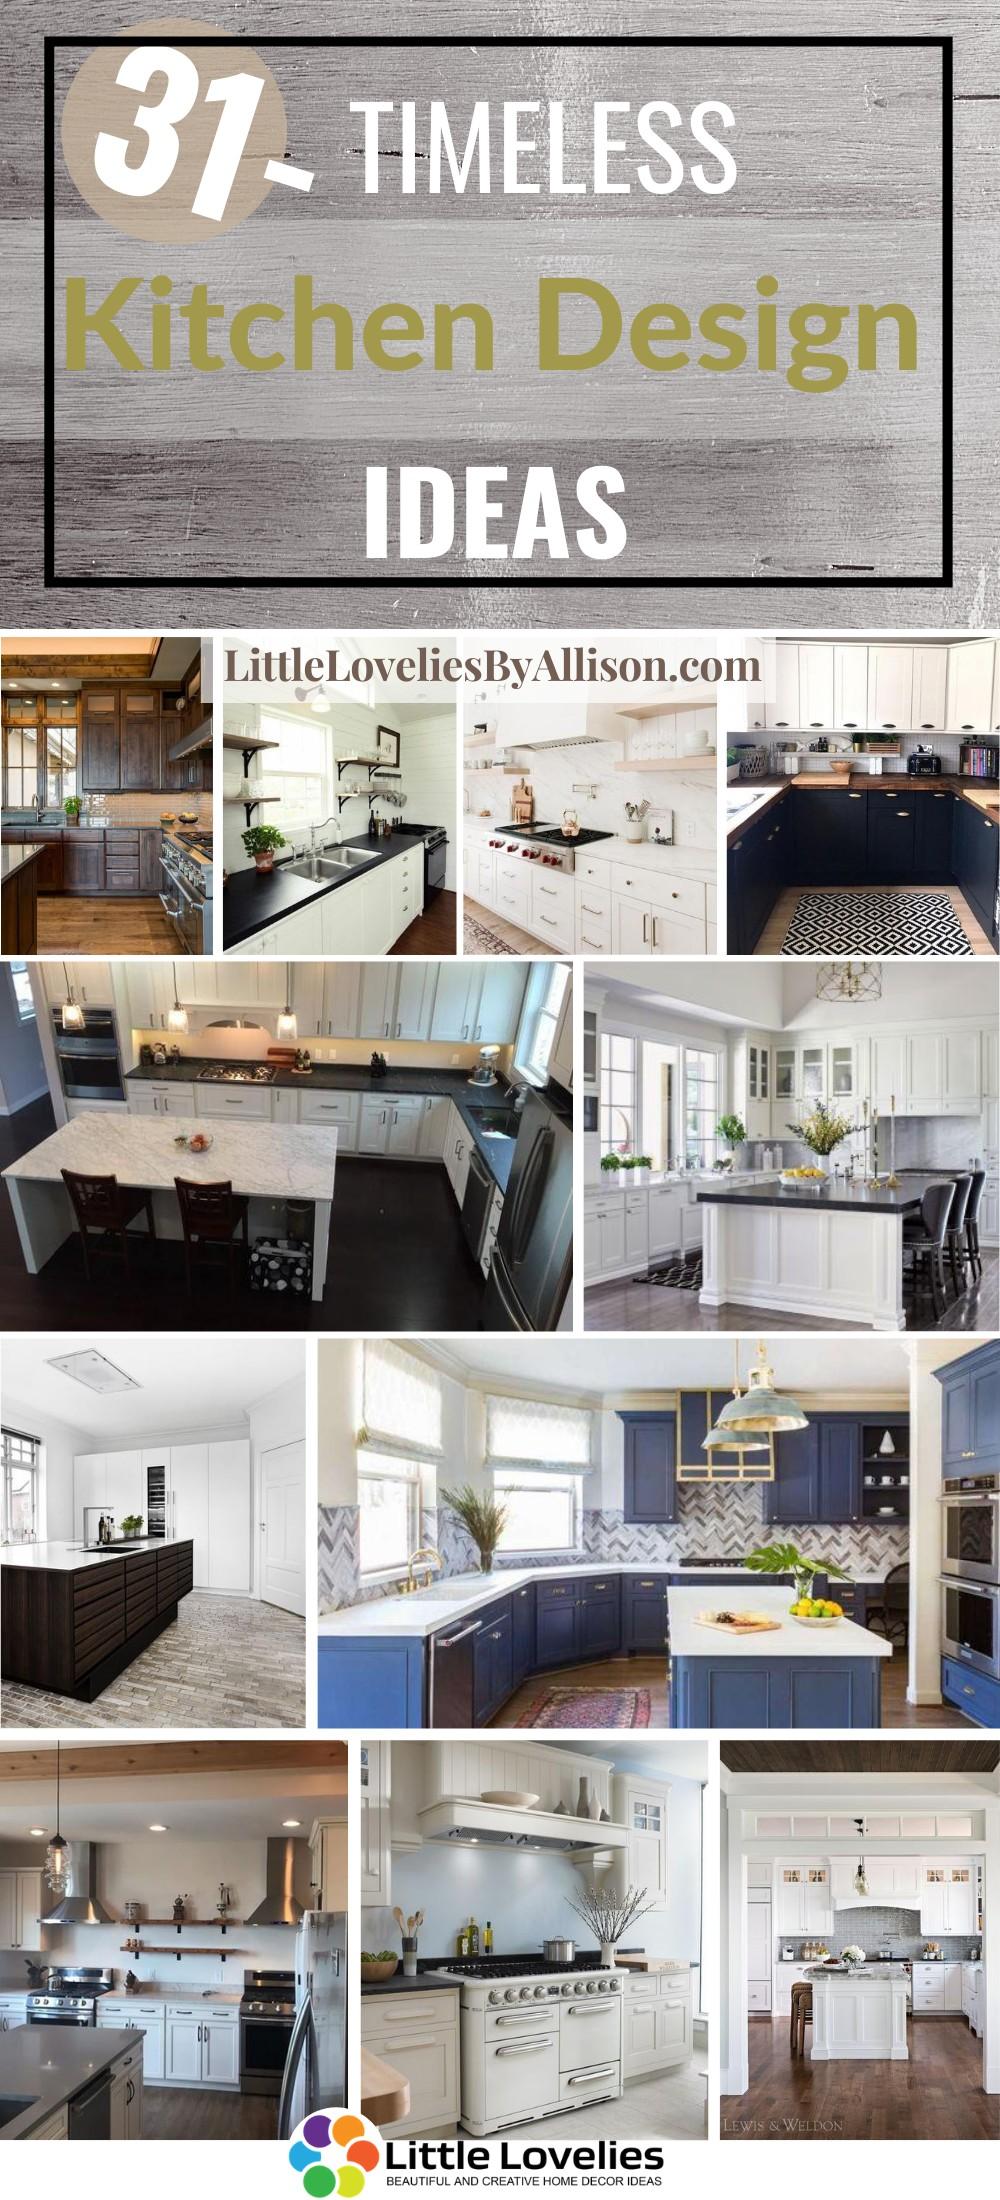 31 Timeless Kitchen Design Ideas